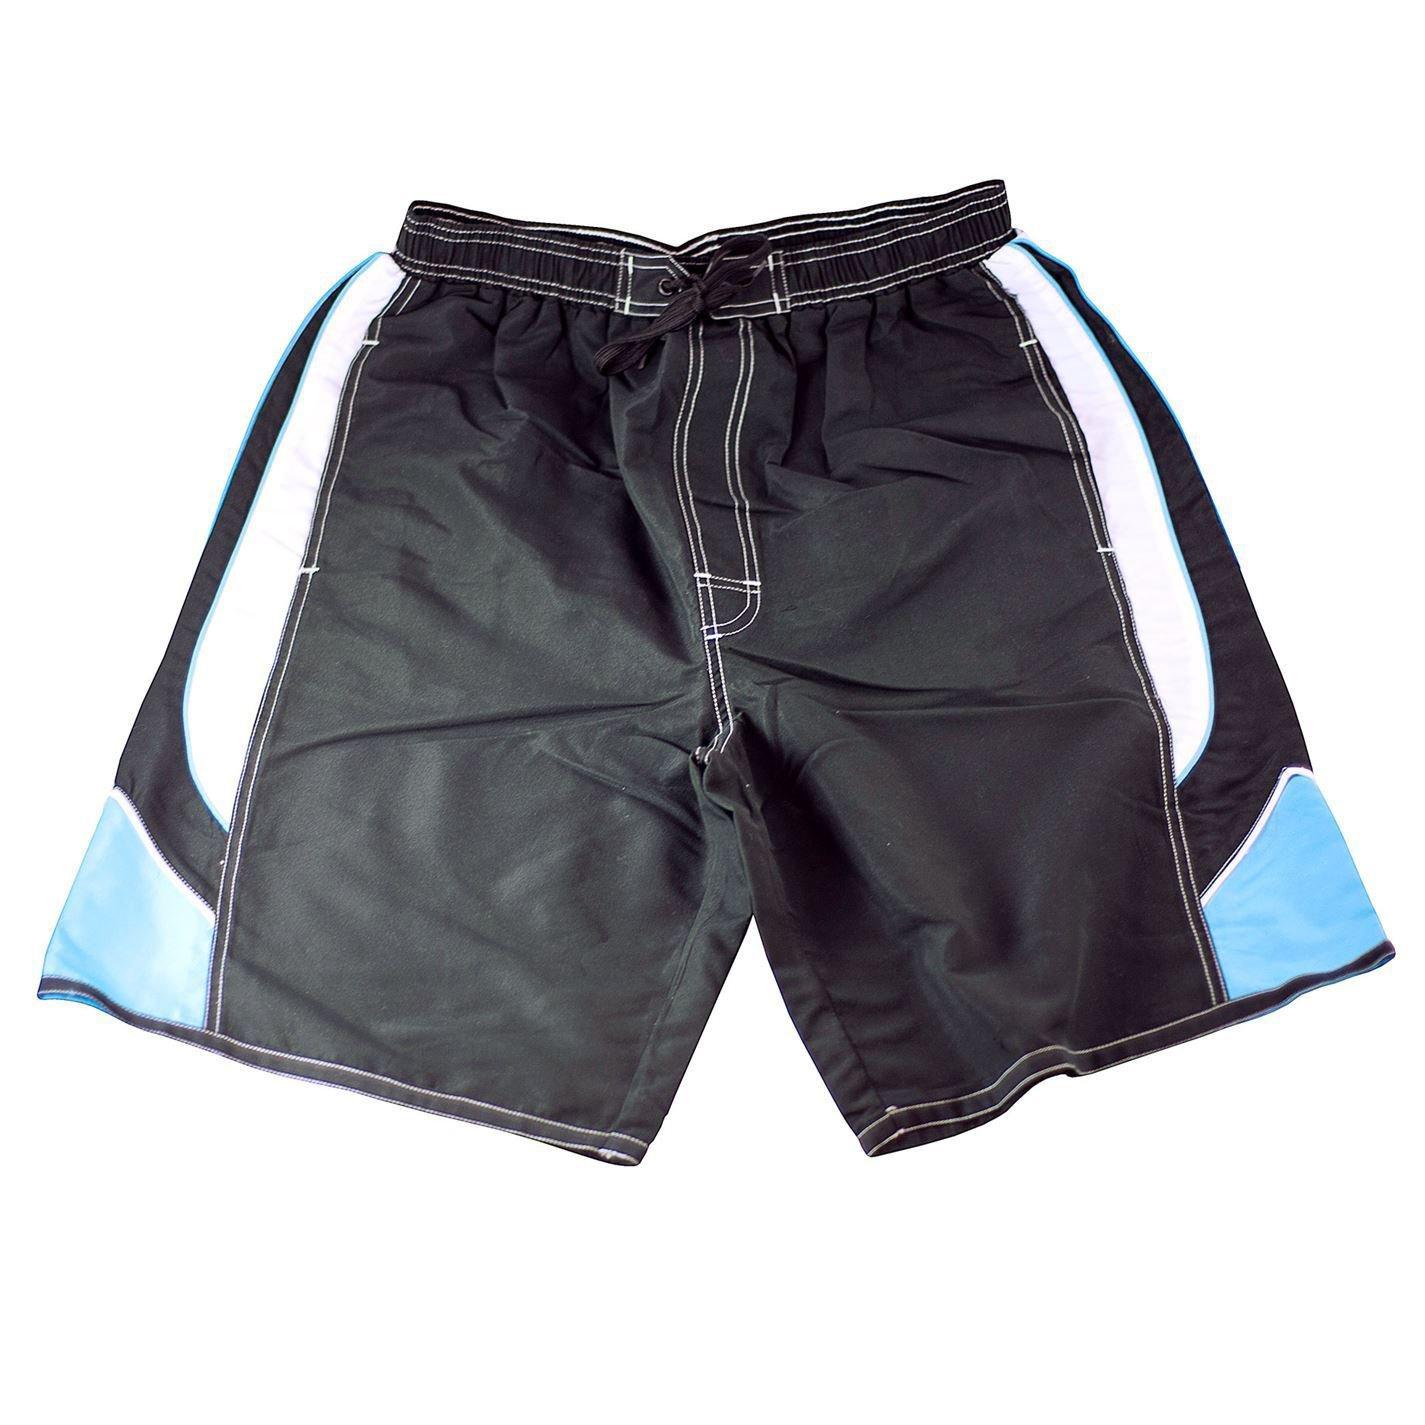 Tyr Mens Arrow Swimming Shorts Swim Shorts Pants Swimsuit Bathsuit